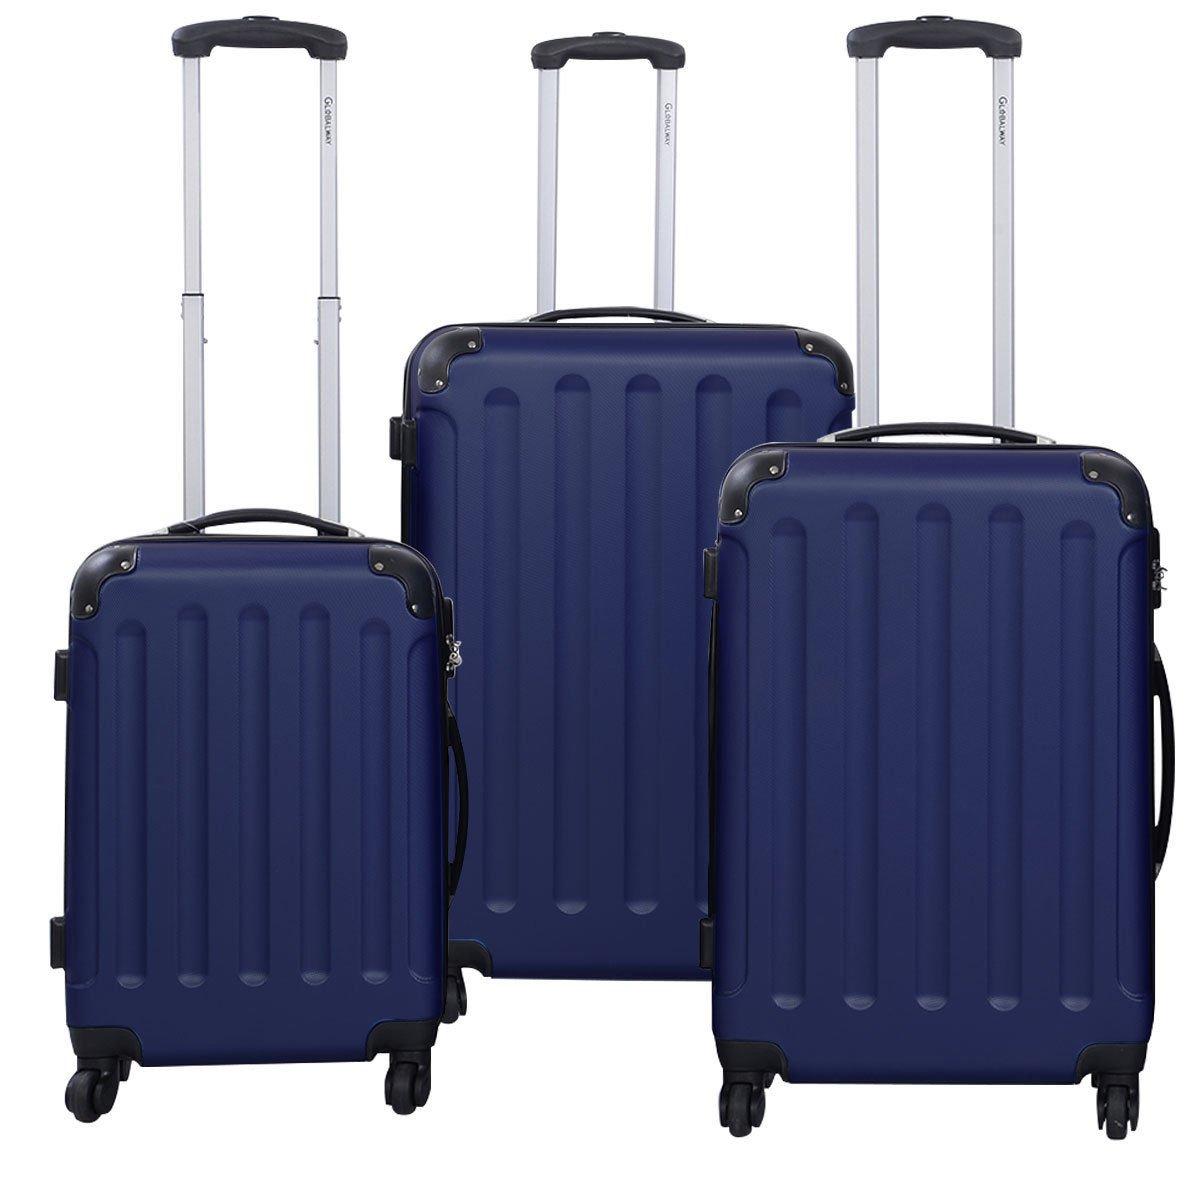 3 Pcs Luggage Travel Set Bag ABS+PC Trolley Suitcase Dark Blue